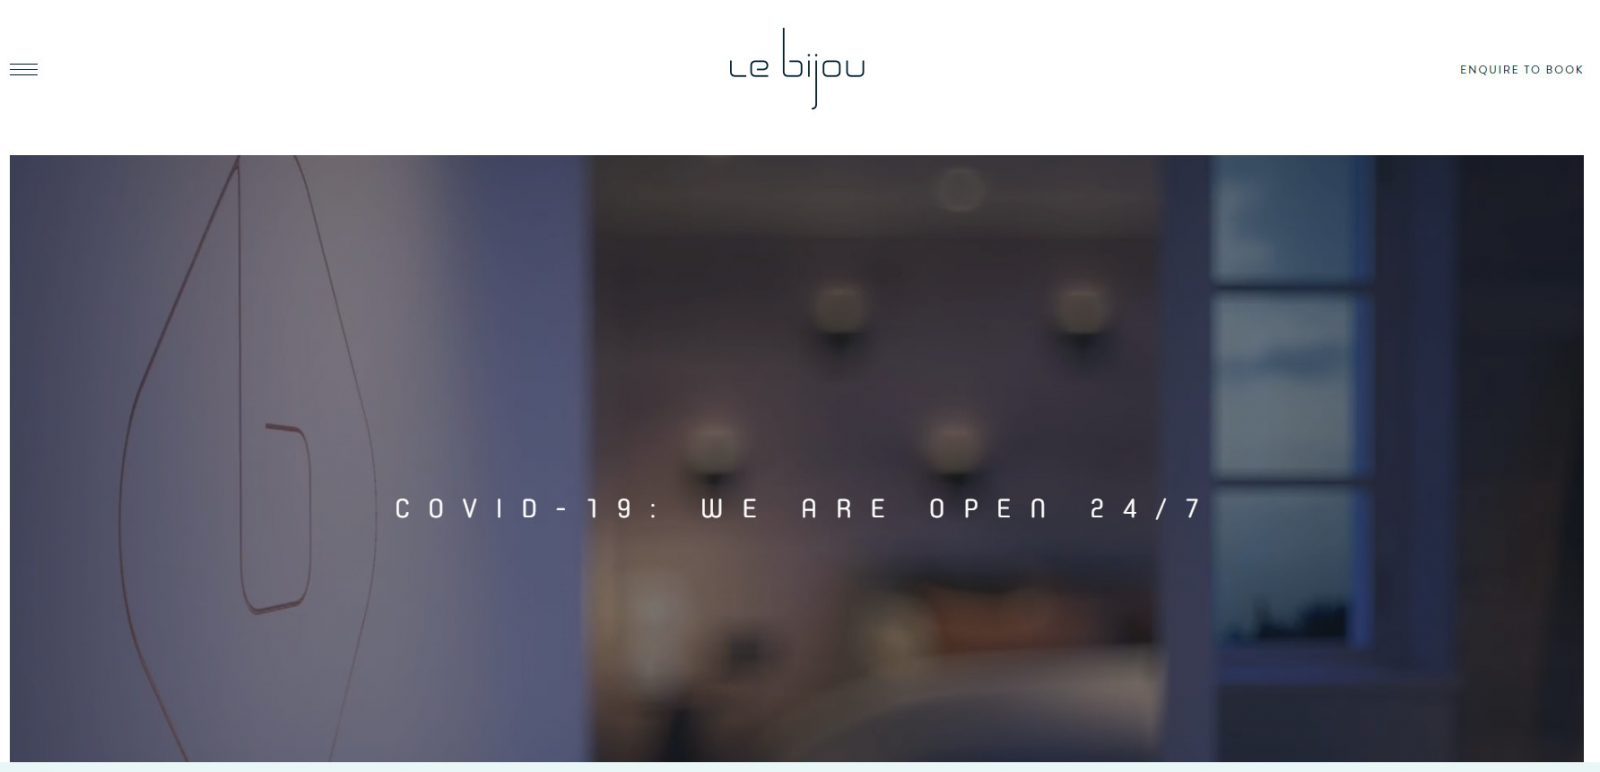 Le Bijou website